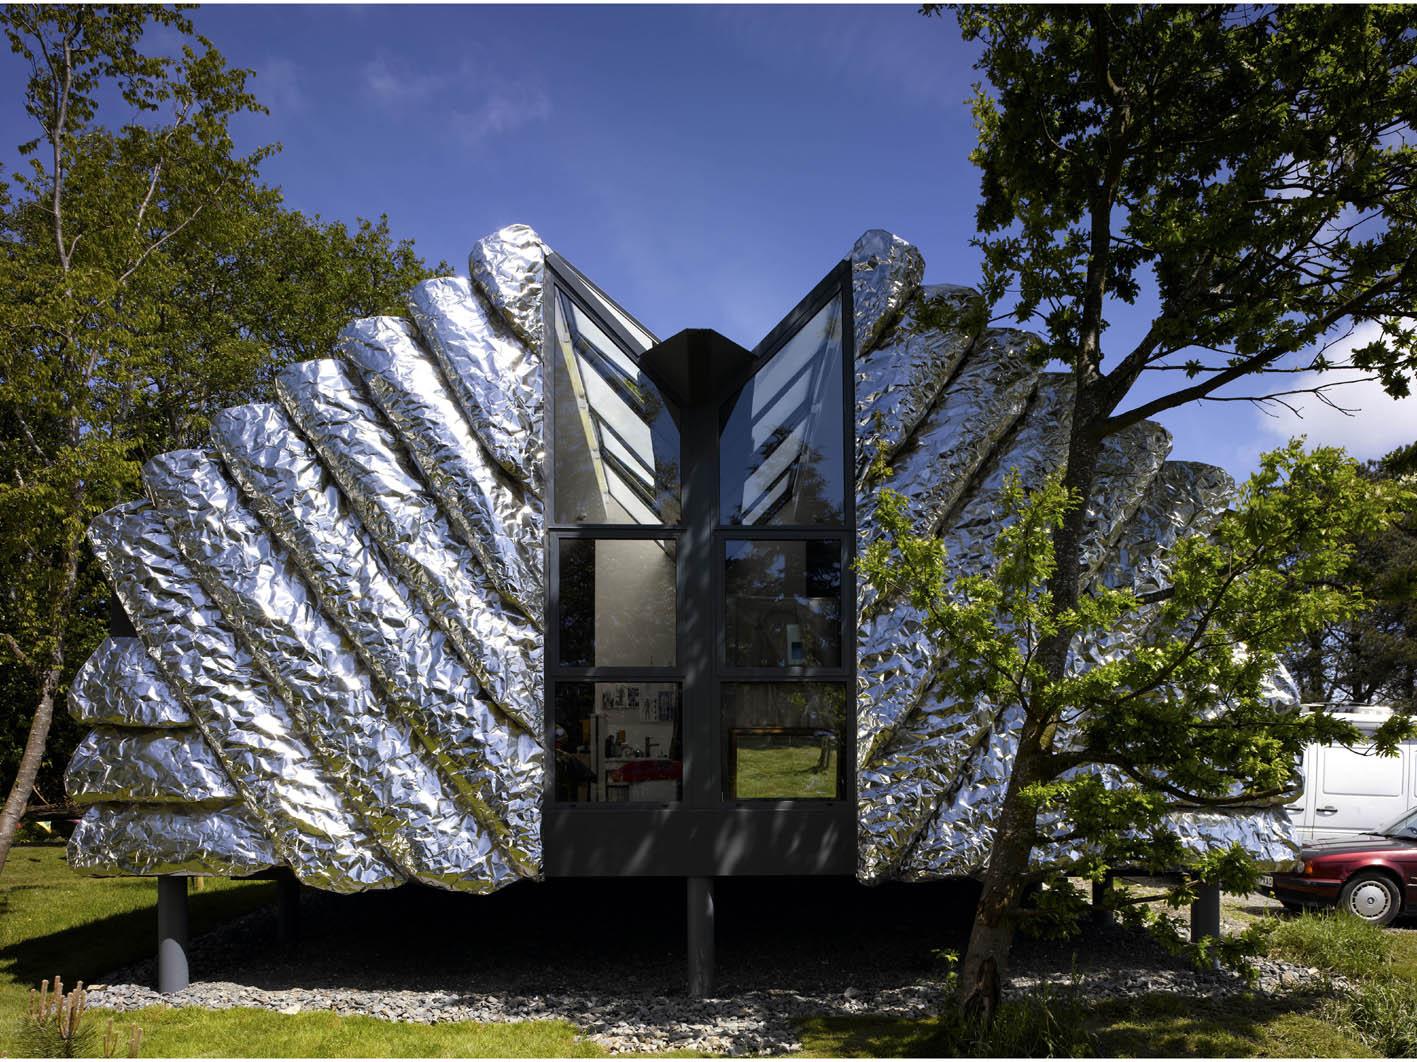 Aberystwyth Creative Units - Front View (c) Edmund Sumner